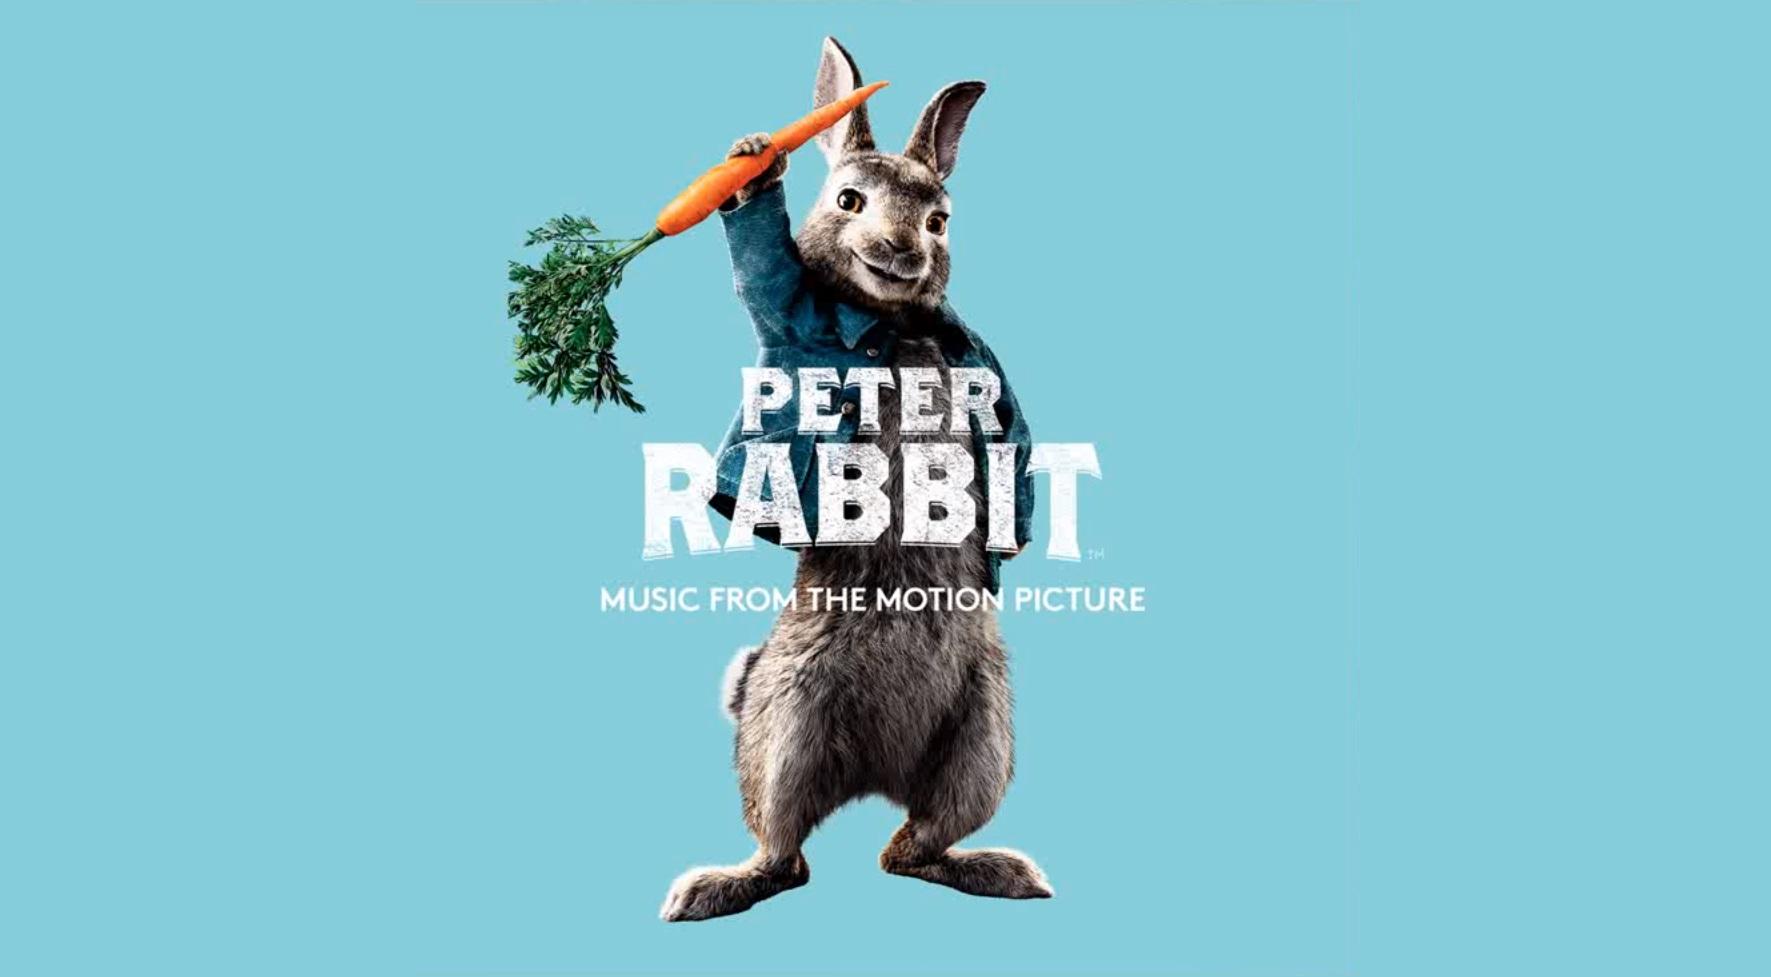 Las Travesuras de Peter Rabbit (Peter Rabbit) – Soundtrack, Tráiler